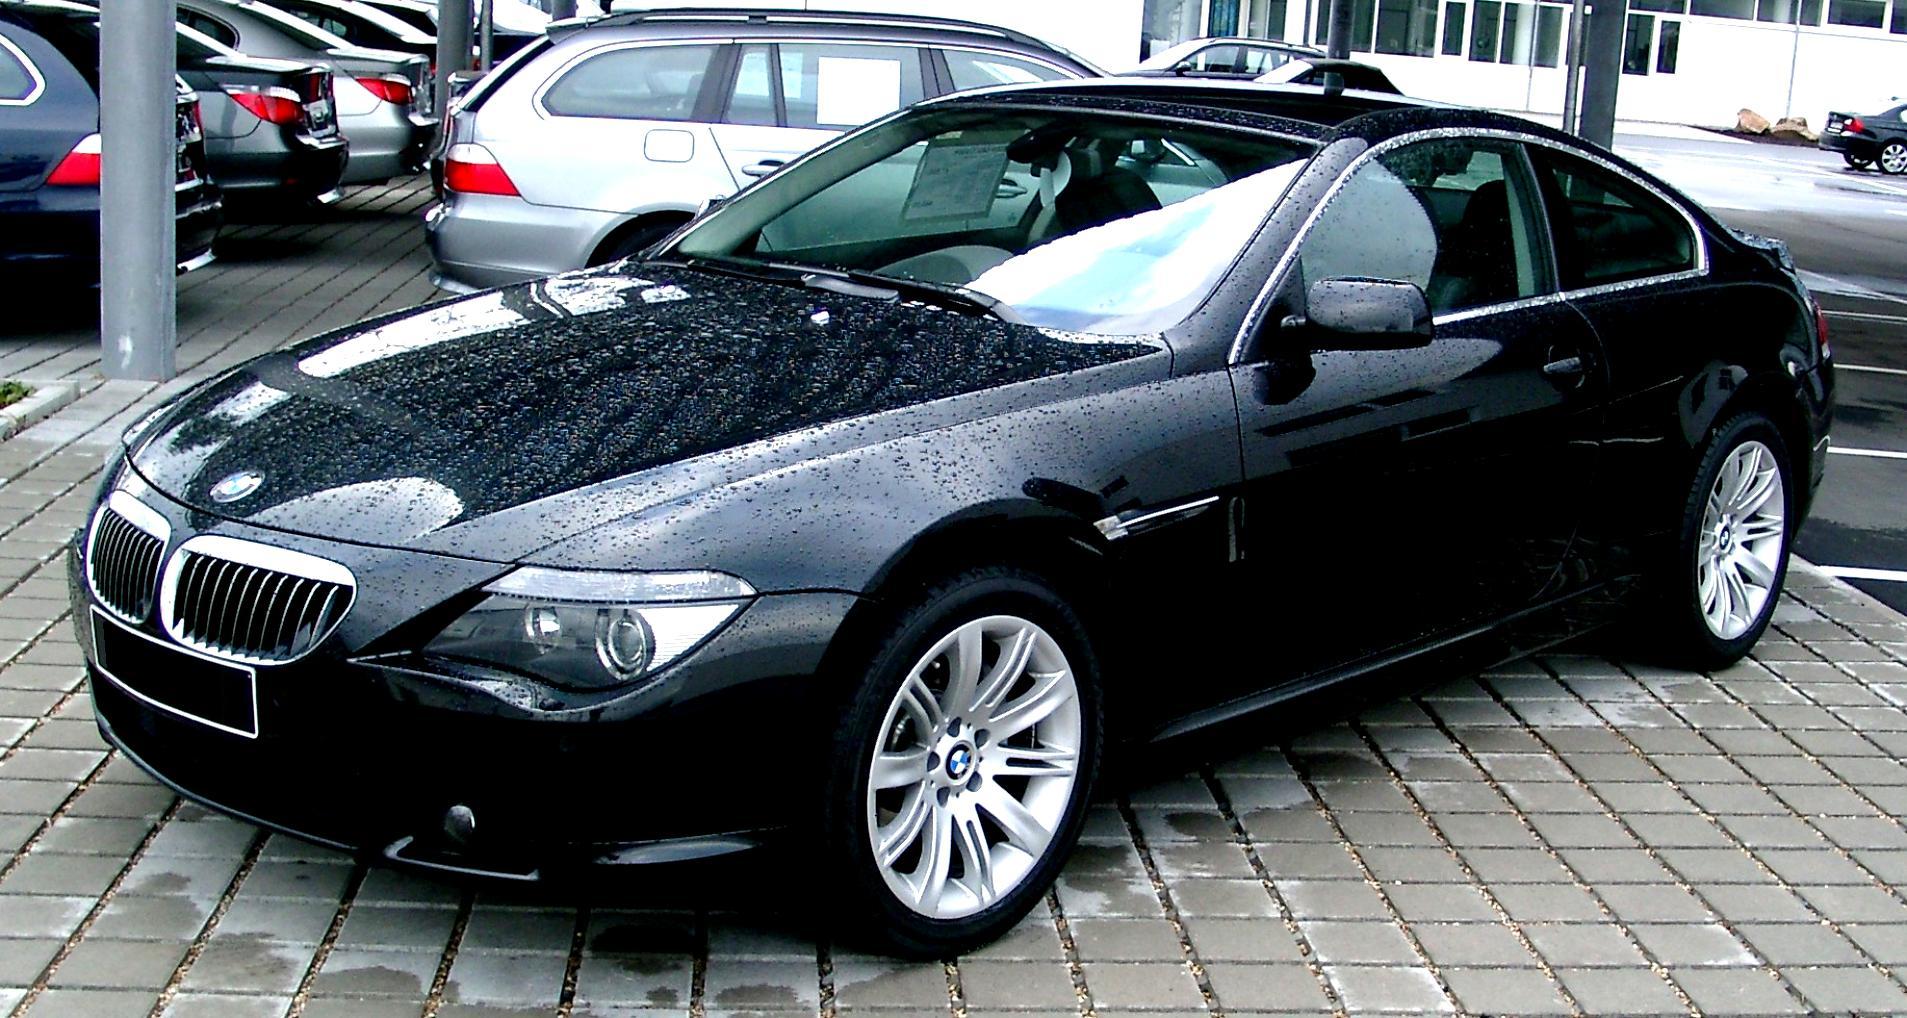 BMW Series Coupe E On MotoImgcom - 2003 bmw 6 series